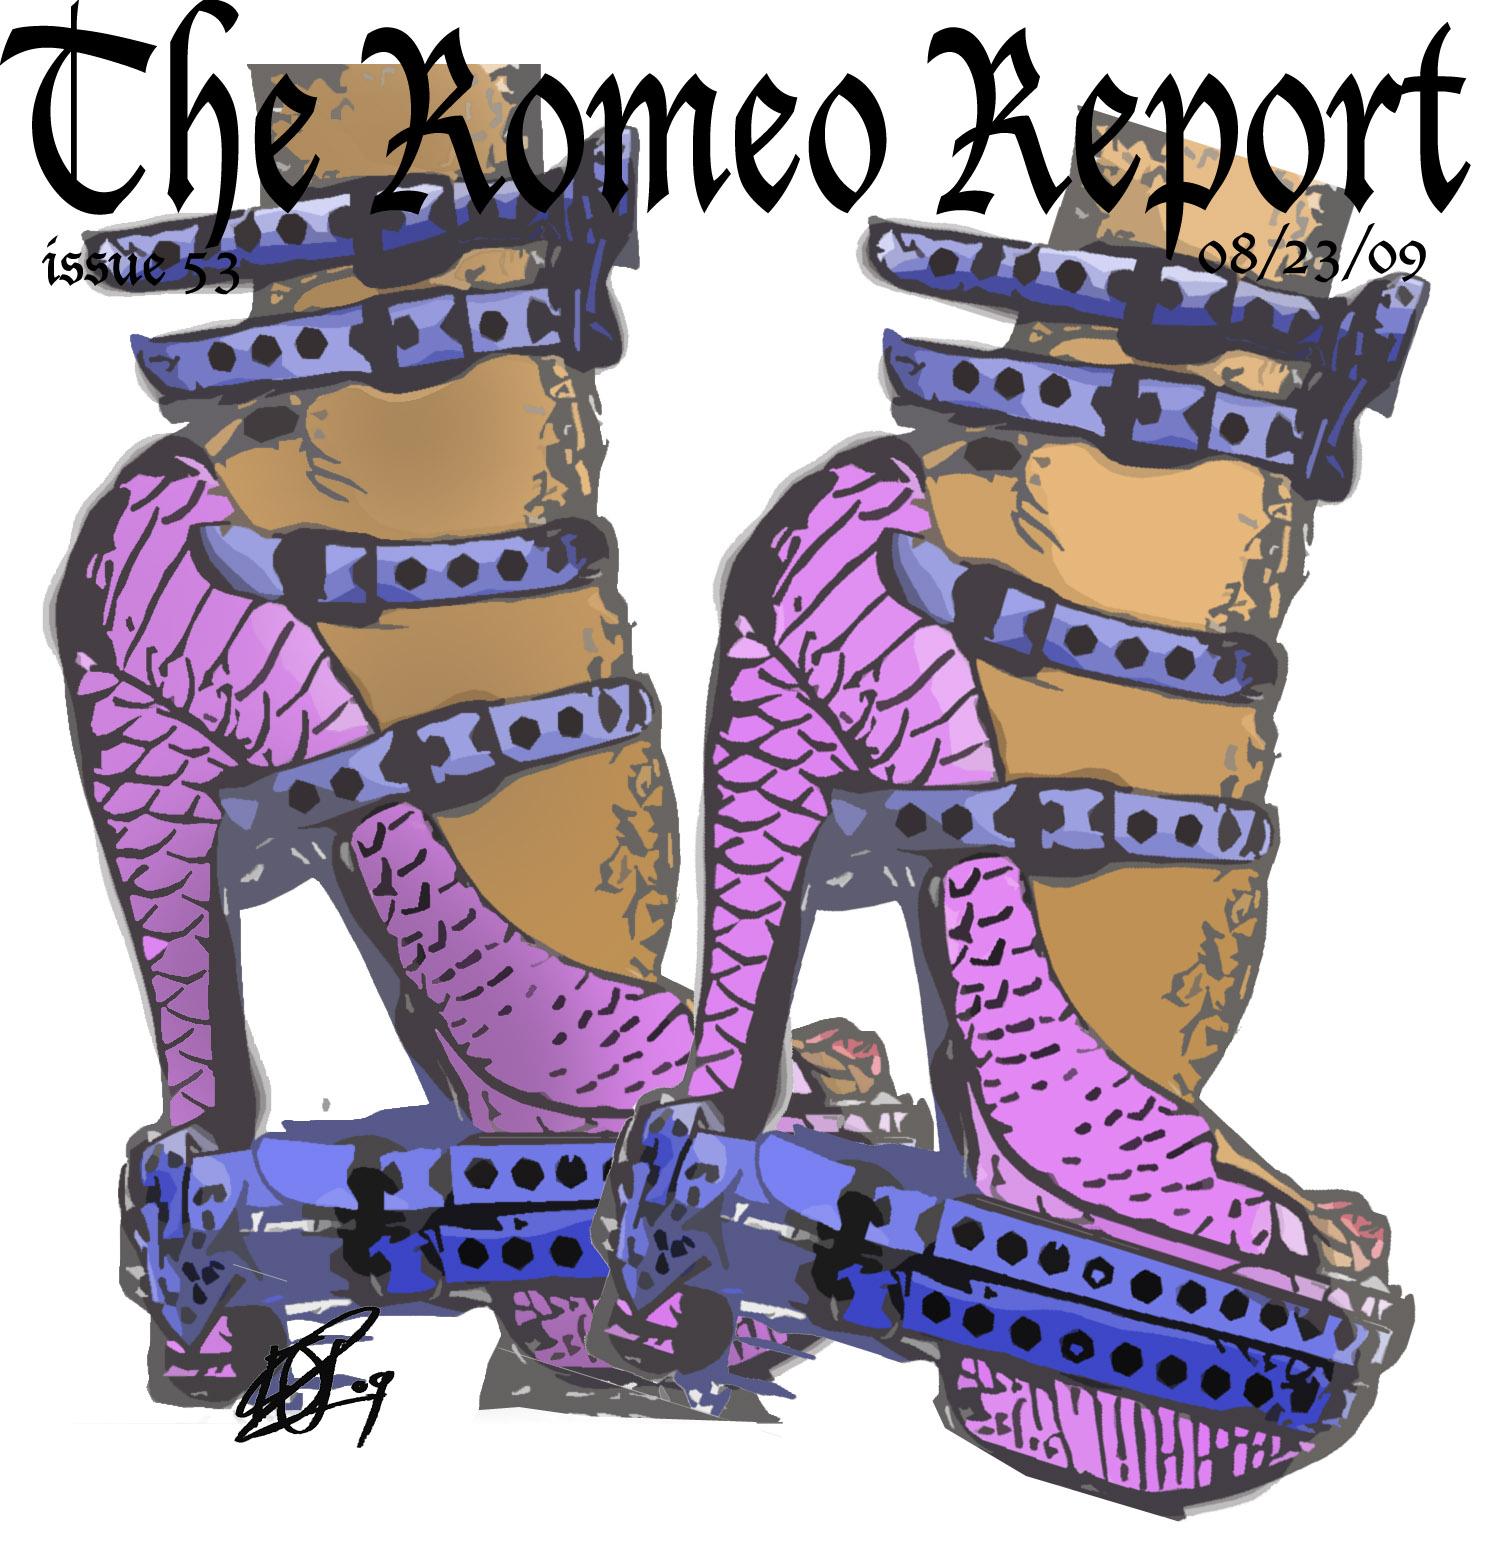 theromeoreport issue 53